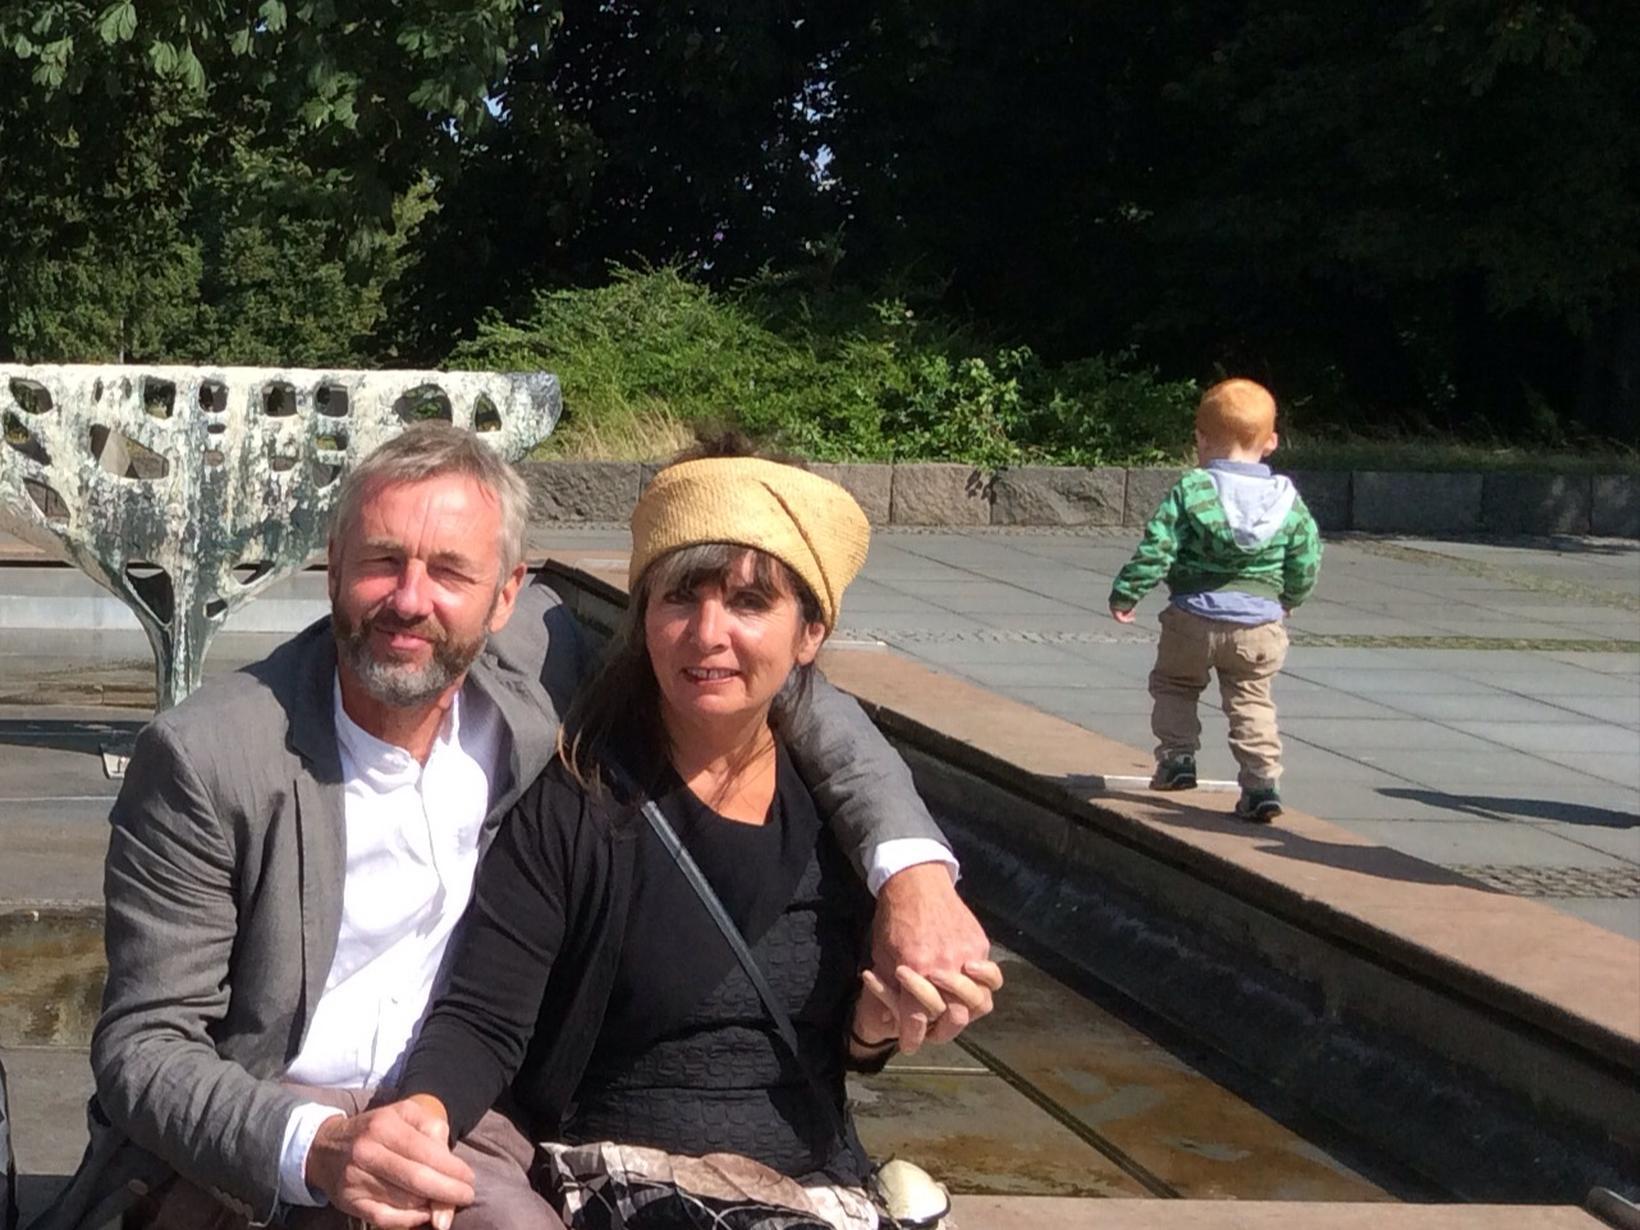 Frieda & Hans from Cork, Ireland